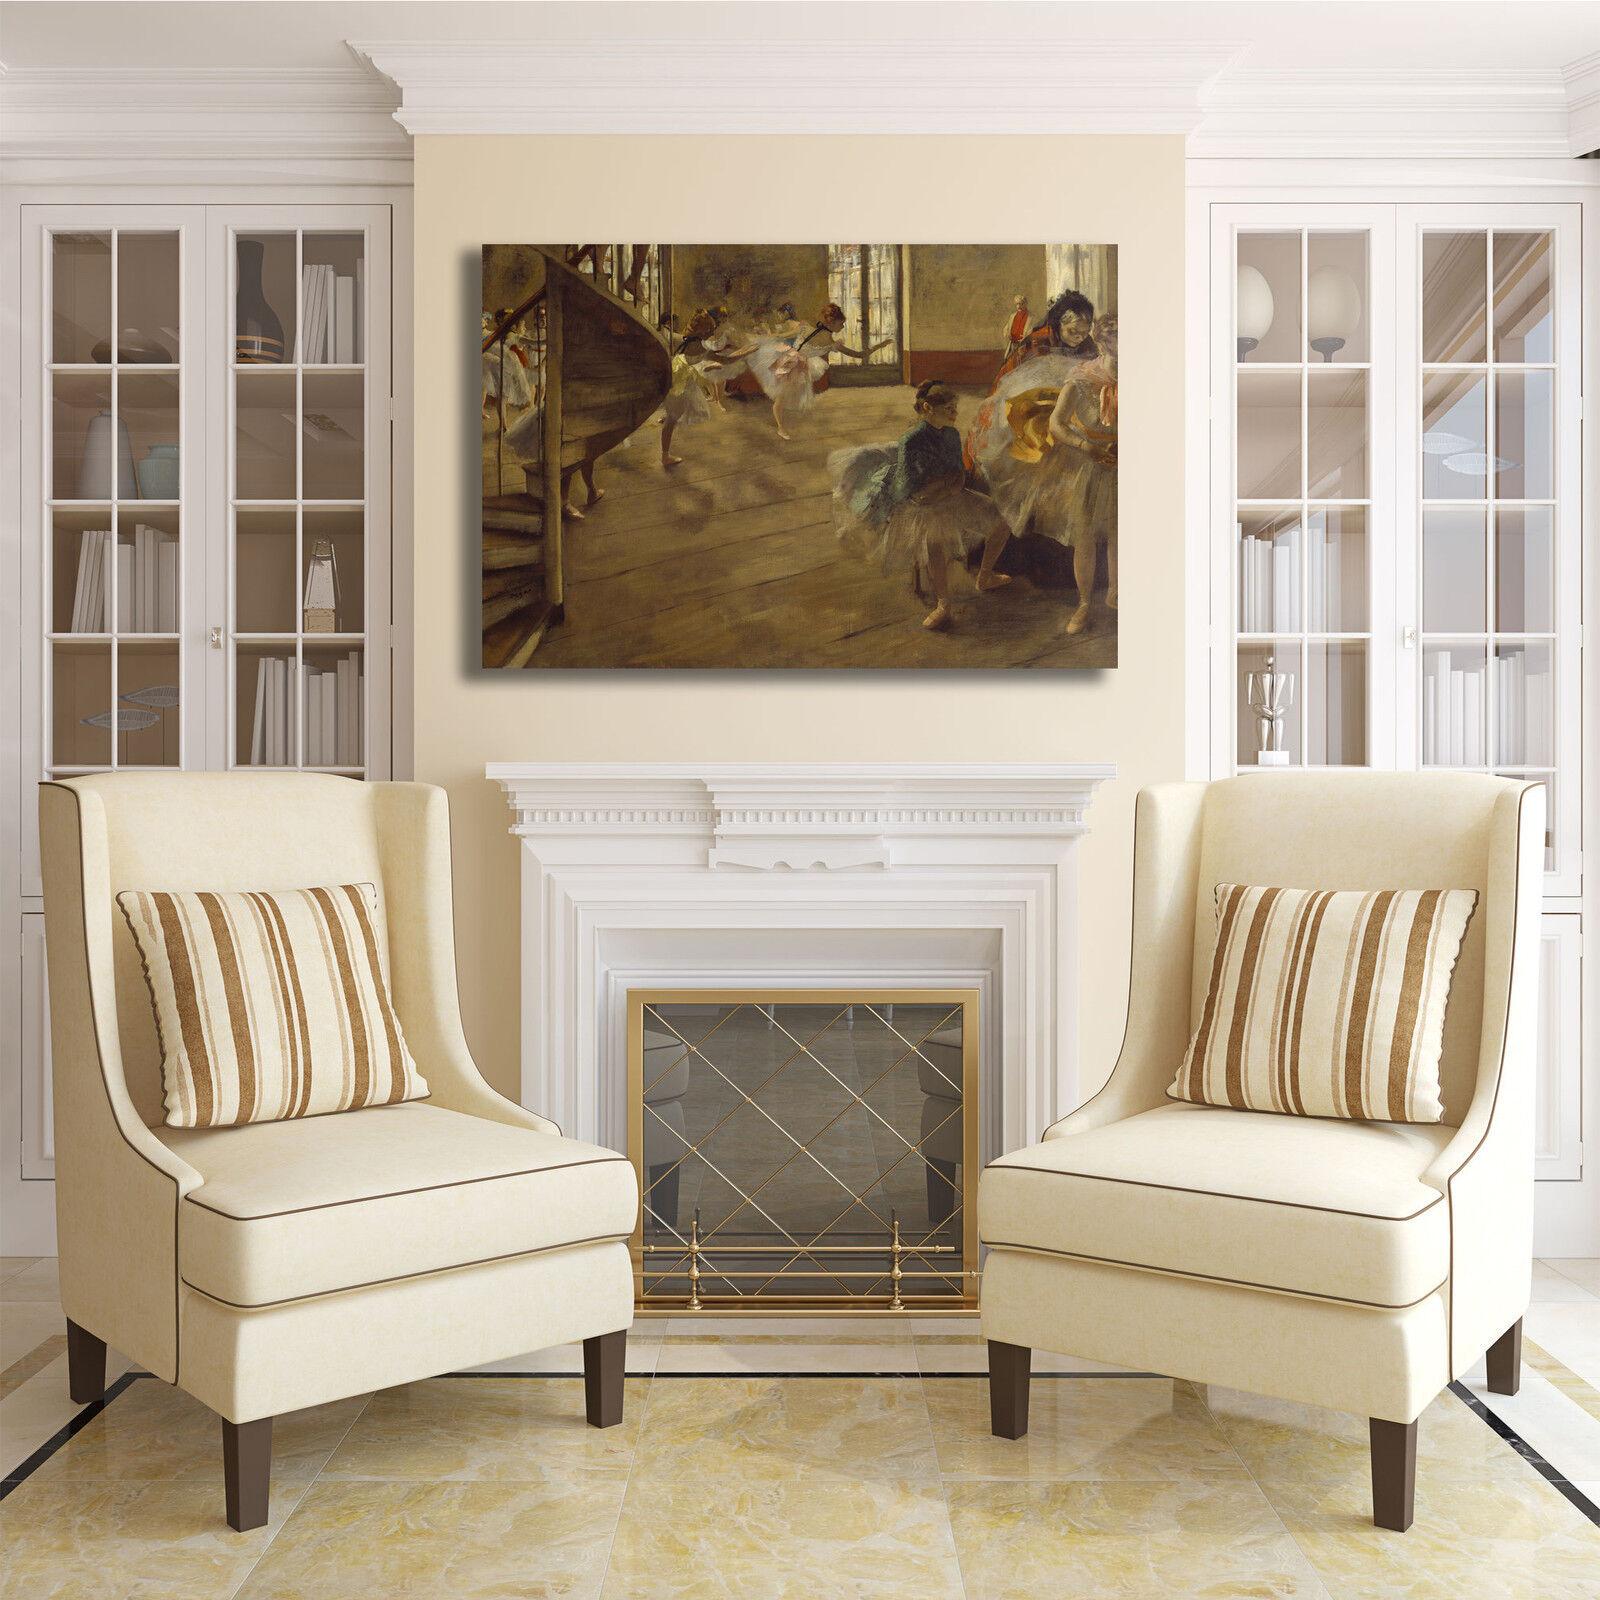 Degas ballerine design telaio quadro stampa tela dipinto telaio design arRouge o casa 7b3e41